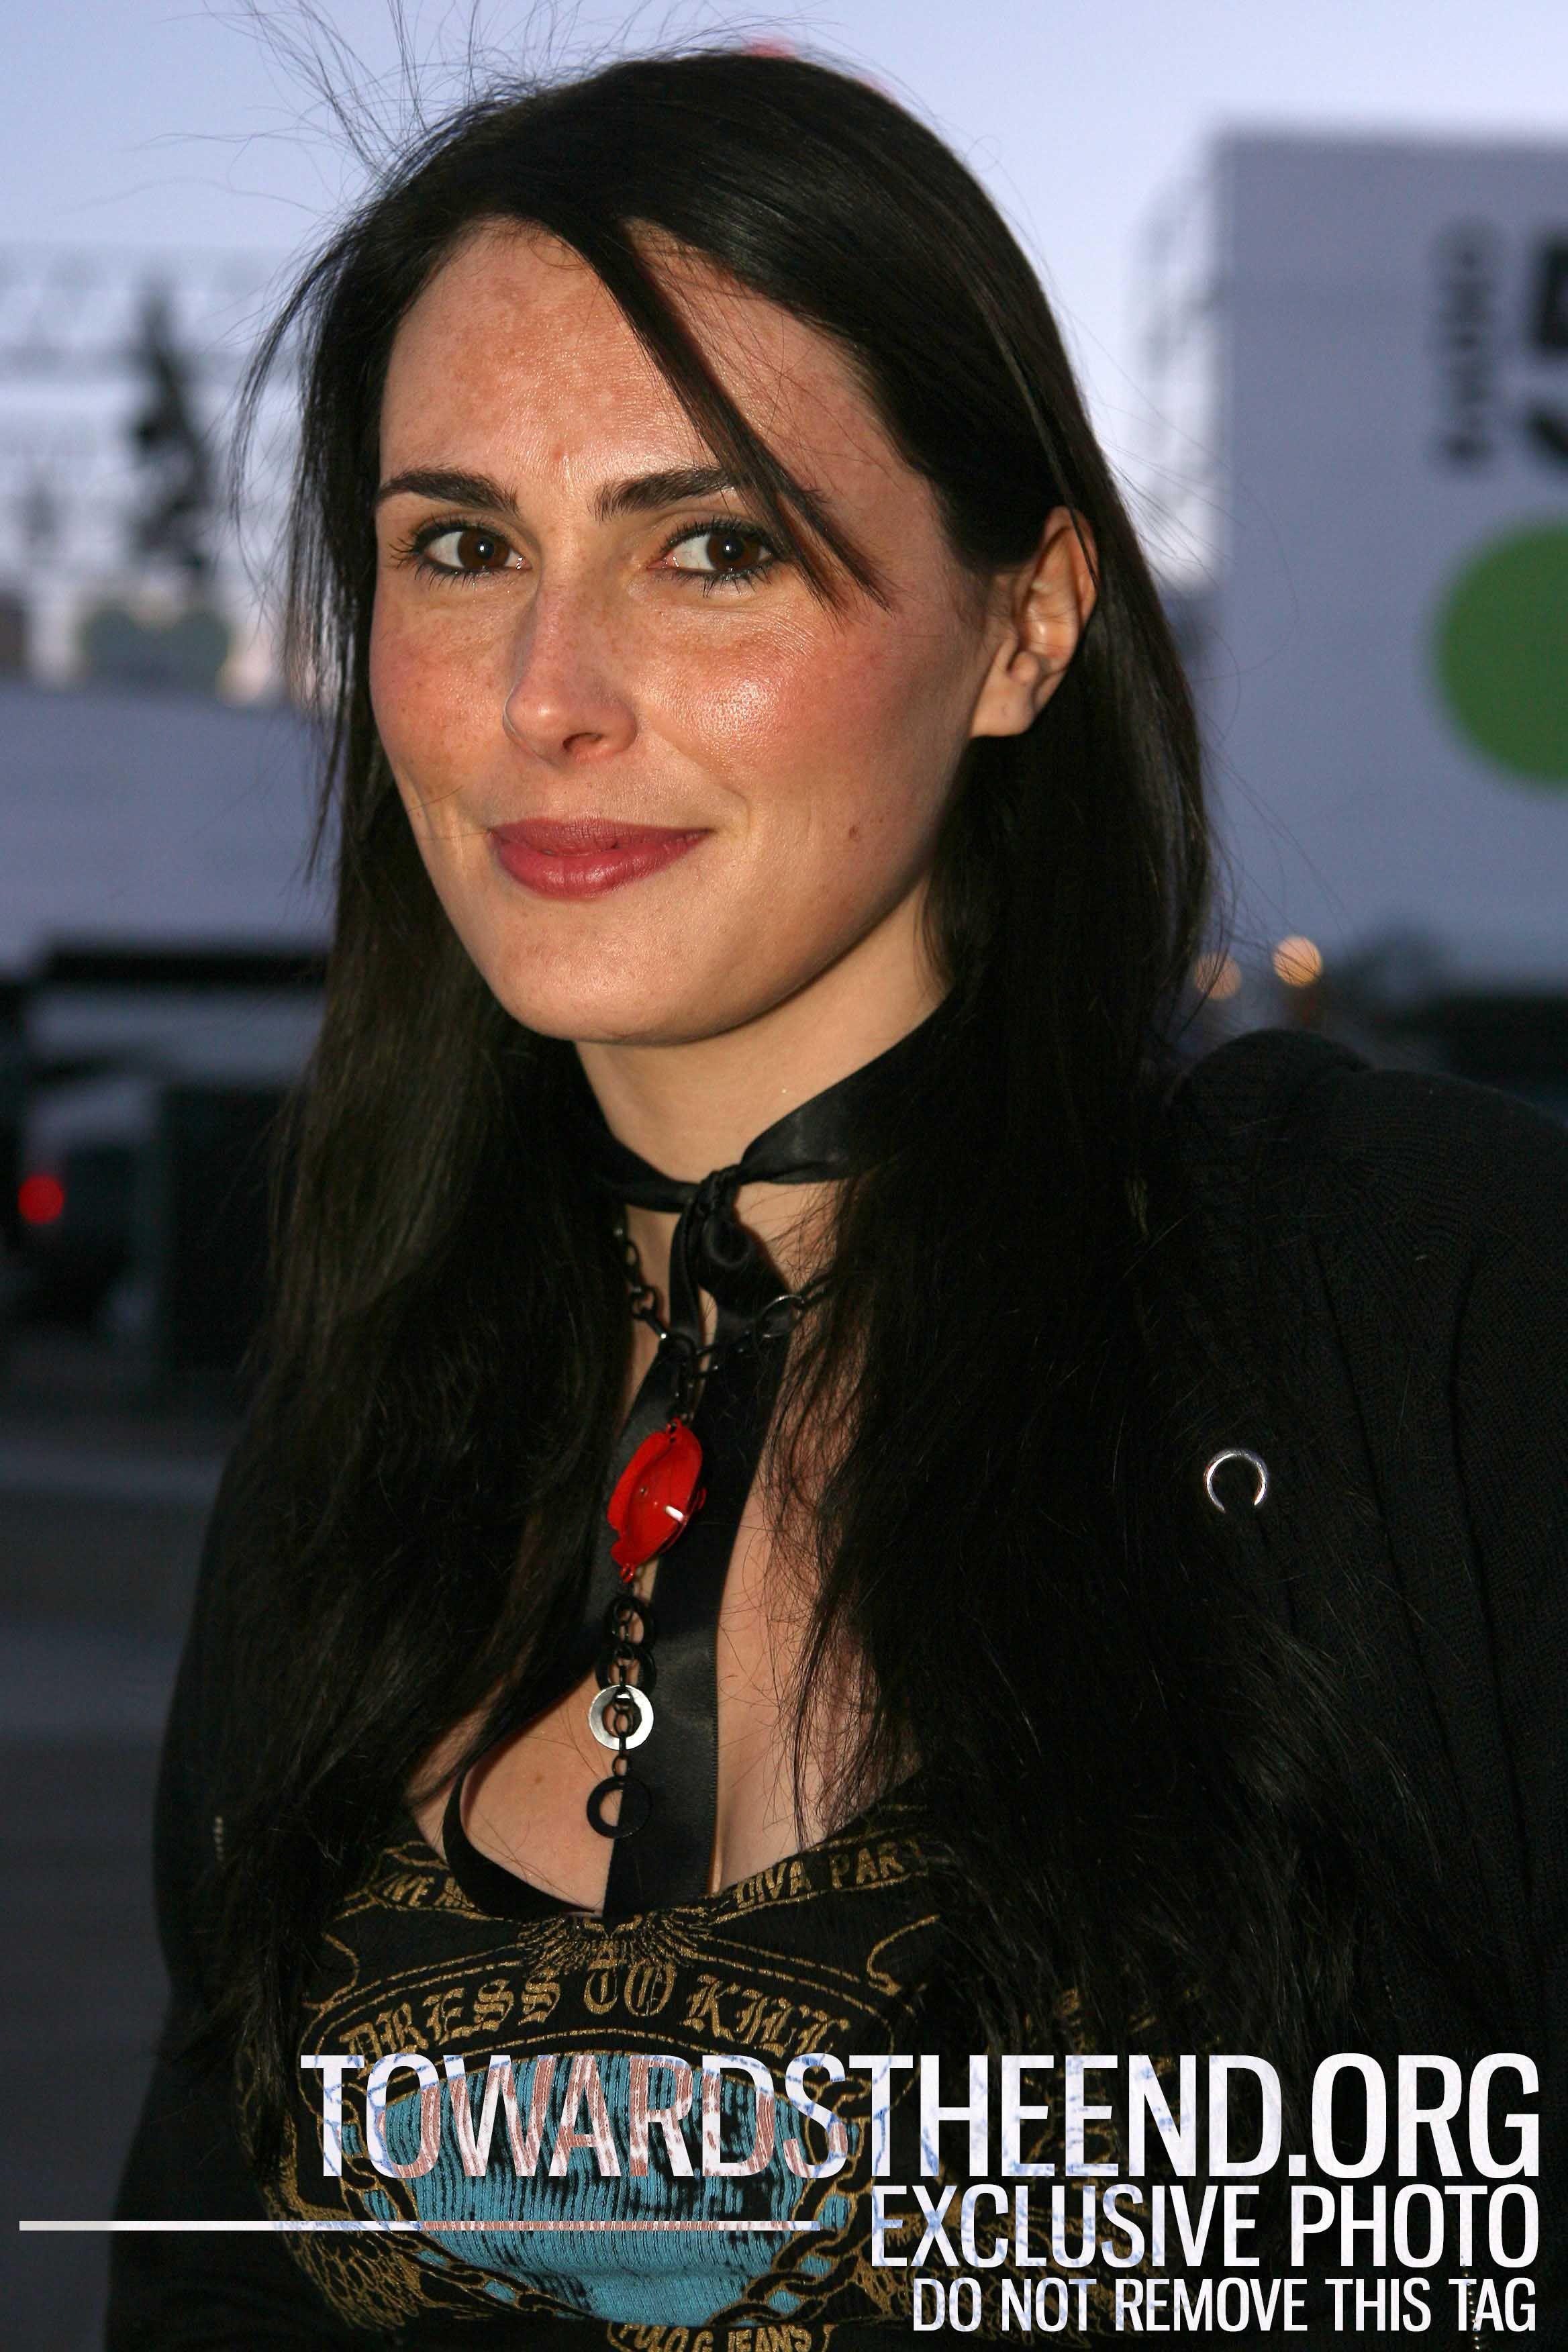 Rate Dutch singer Sharon Den Adel